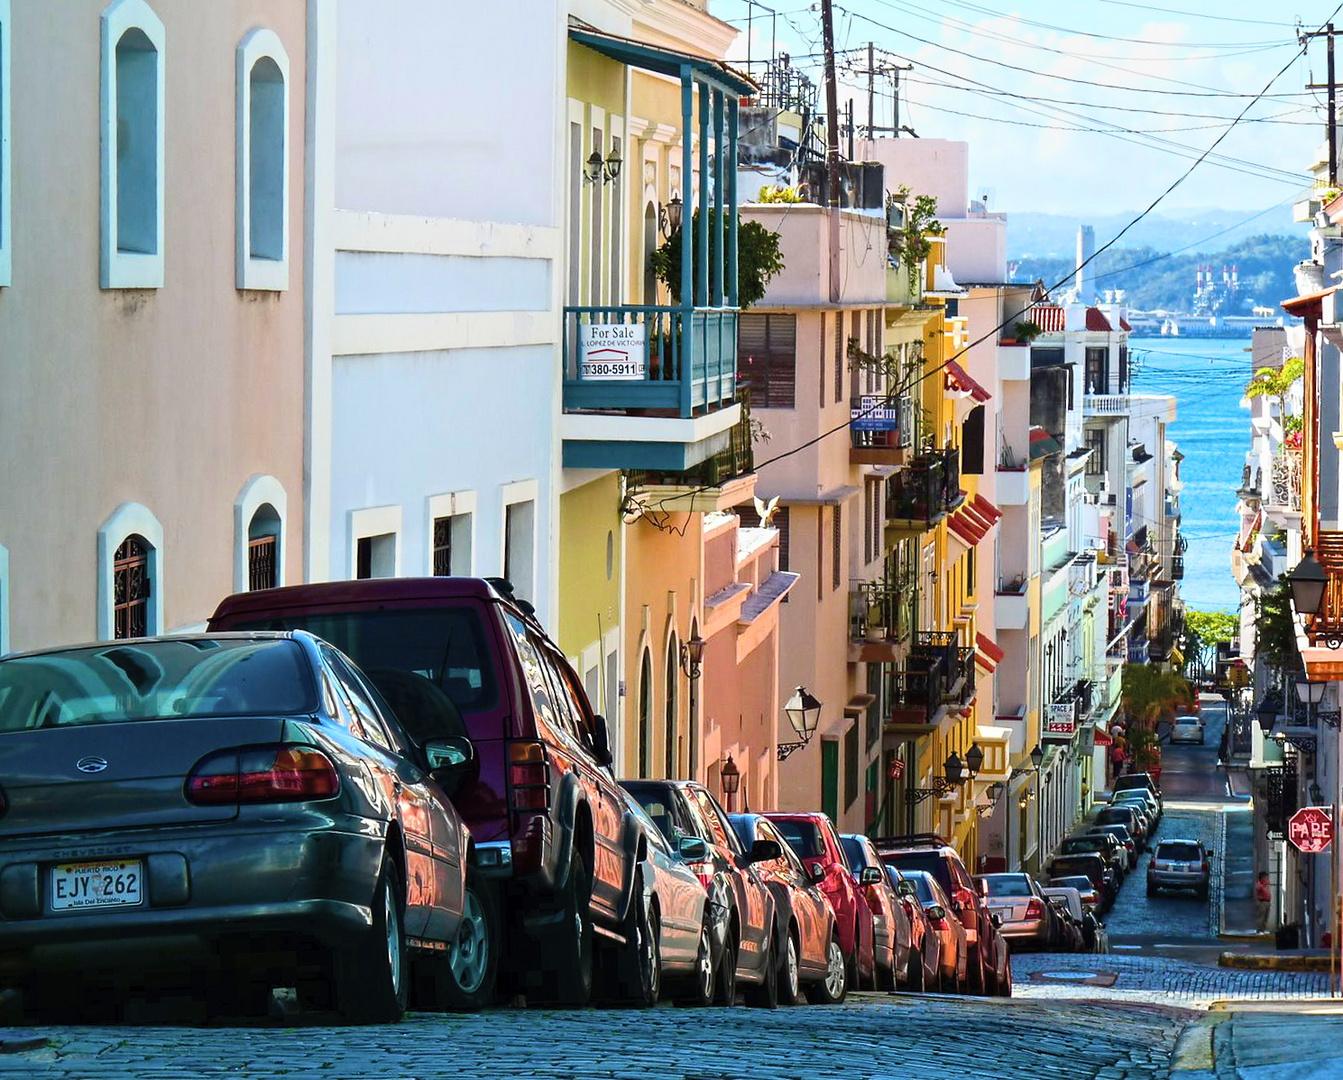 Calles de Puerto Rico